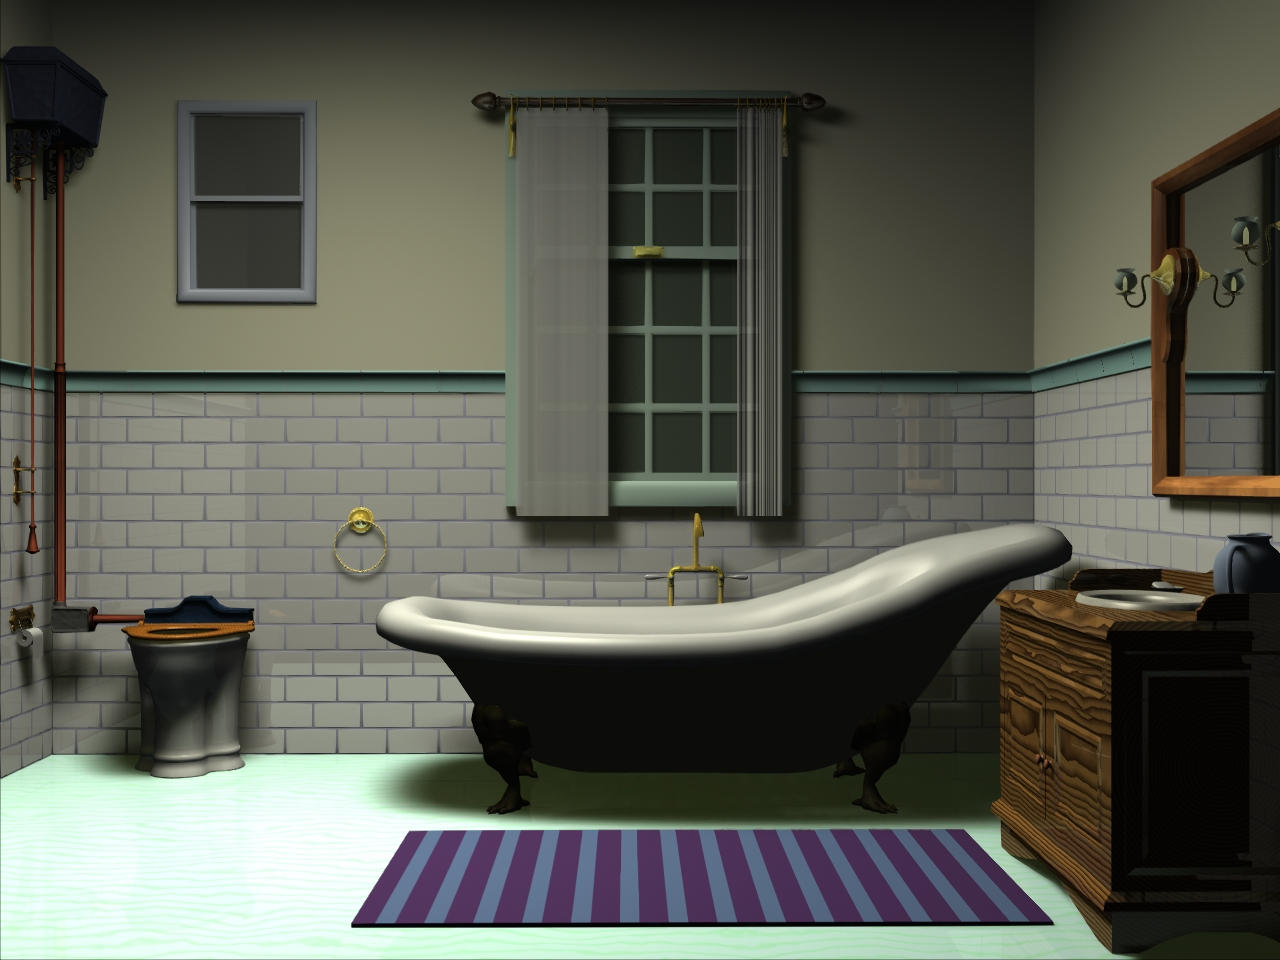 Victorian Bathroom By Voltarrens On Deviantart